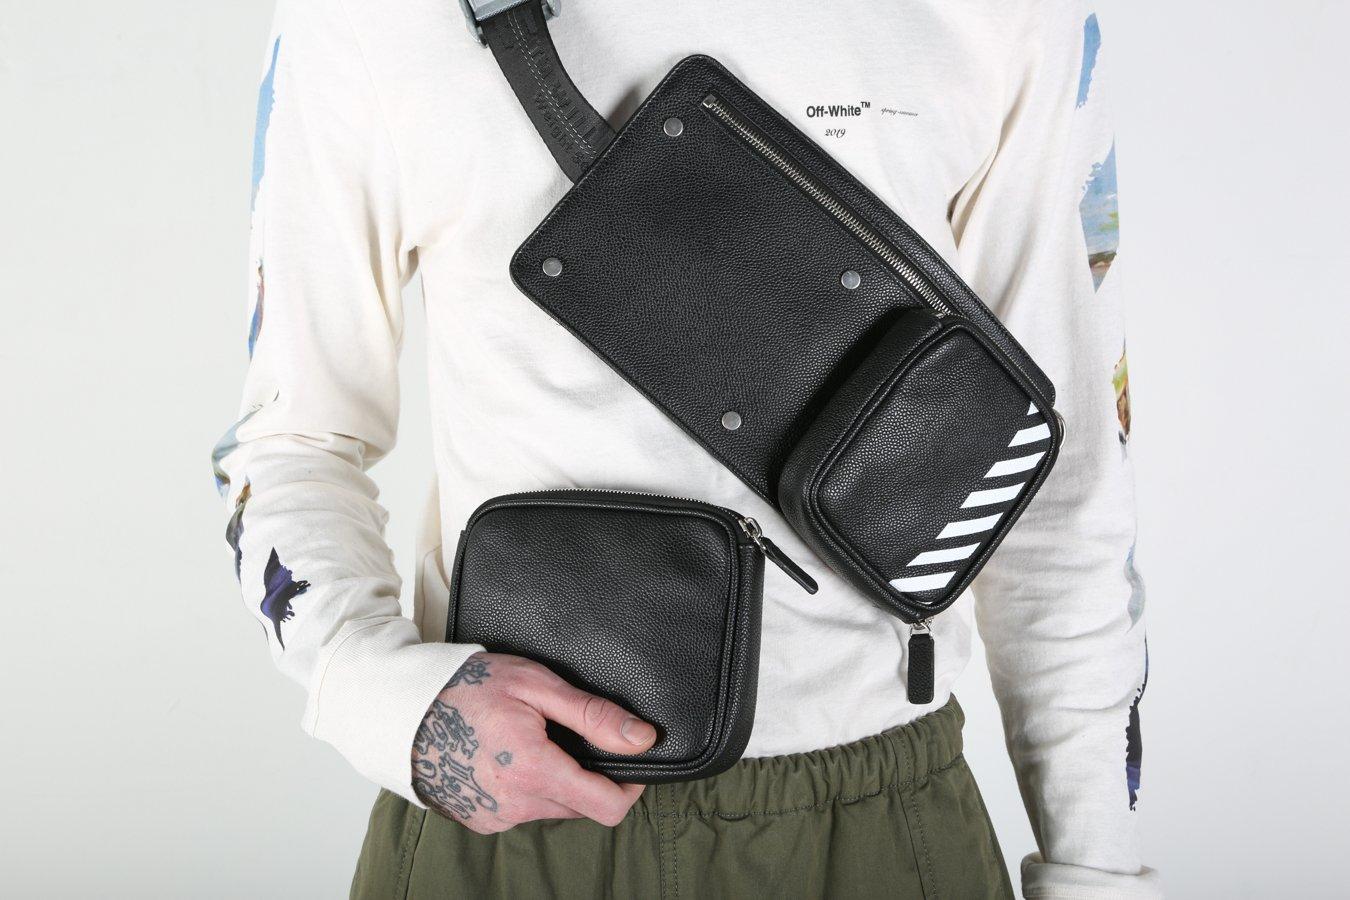 ad07012a7 Off-White c/o Virgil Abloh Diagonal Hip Bag - Black/White | Garmentory